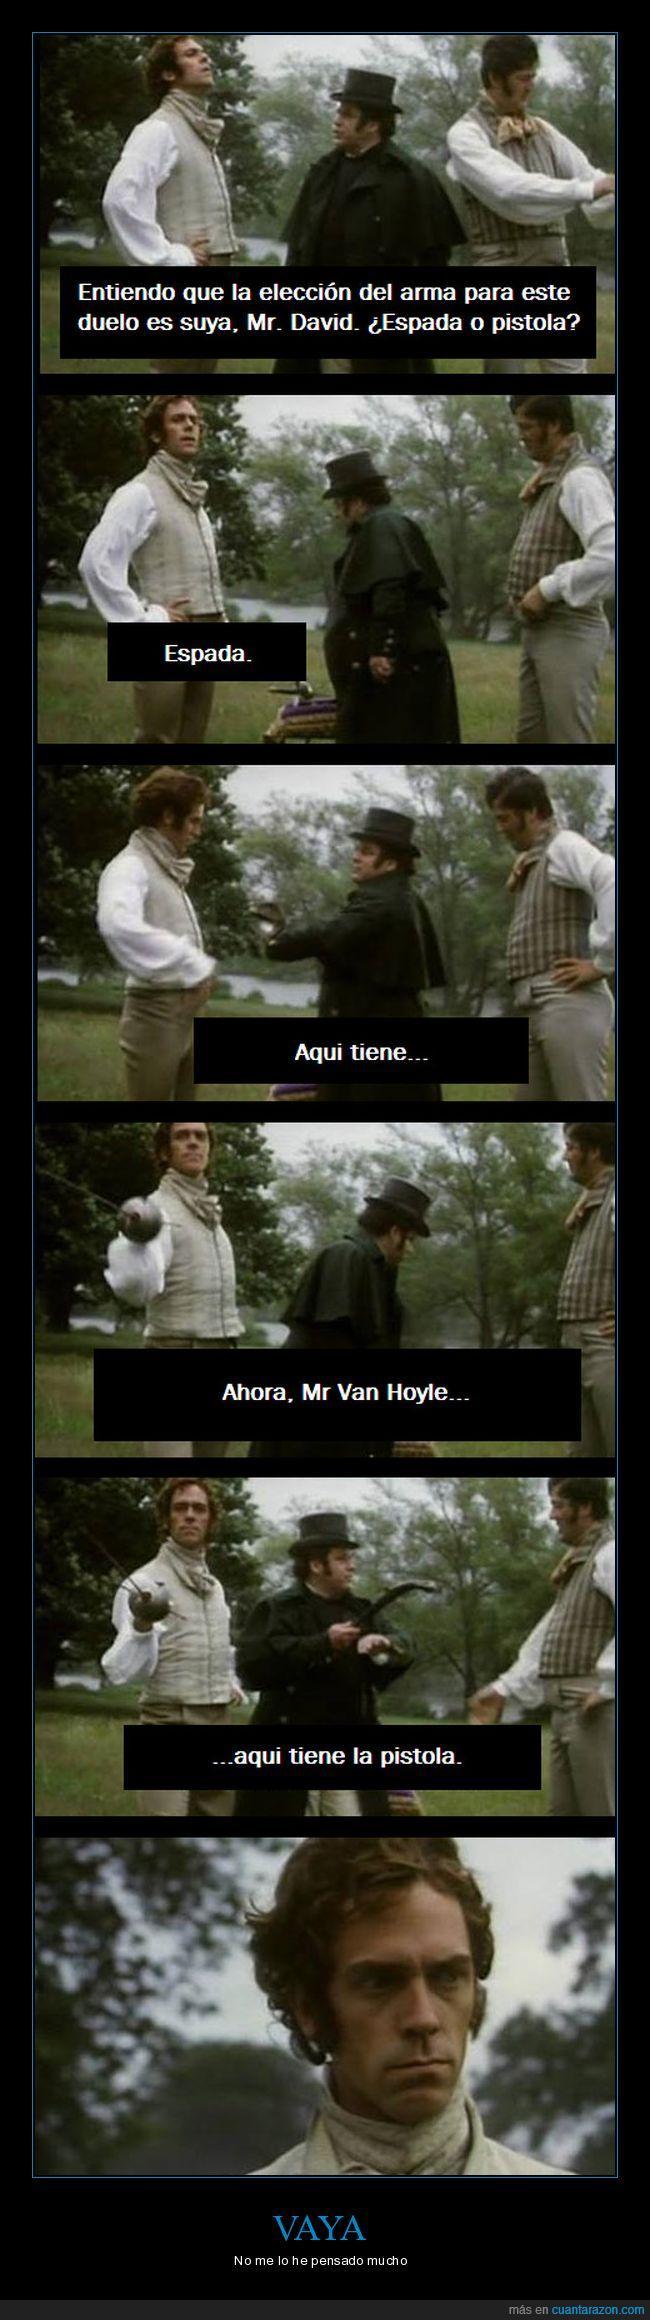 duelo,época,espada,Fry,Hugh Laurie,pistola,Serie